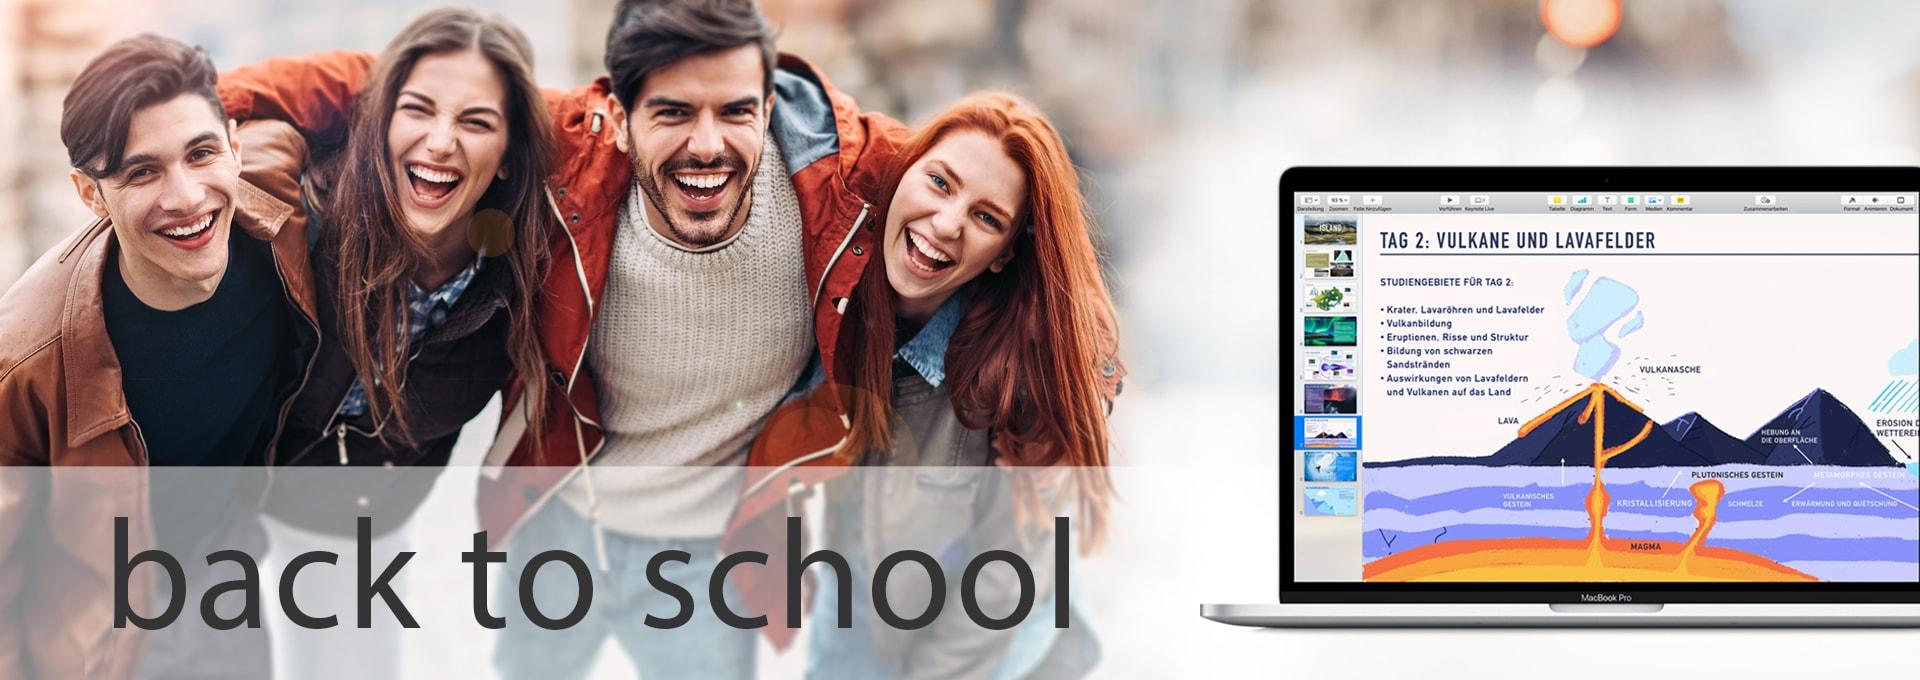 Back To School und Neptun Kampagne 2018